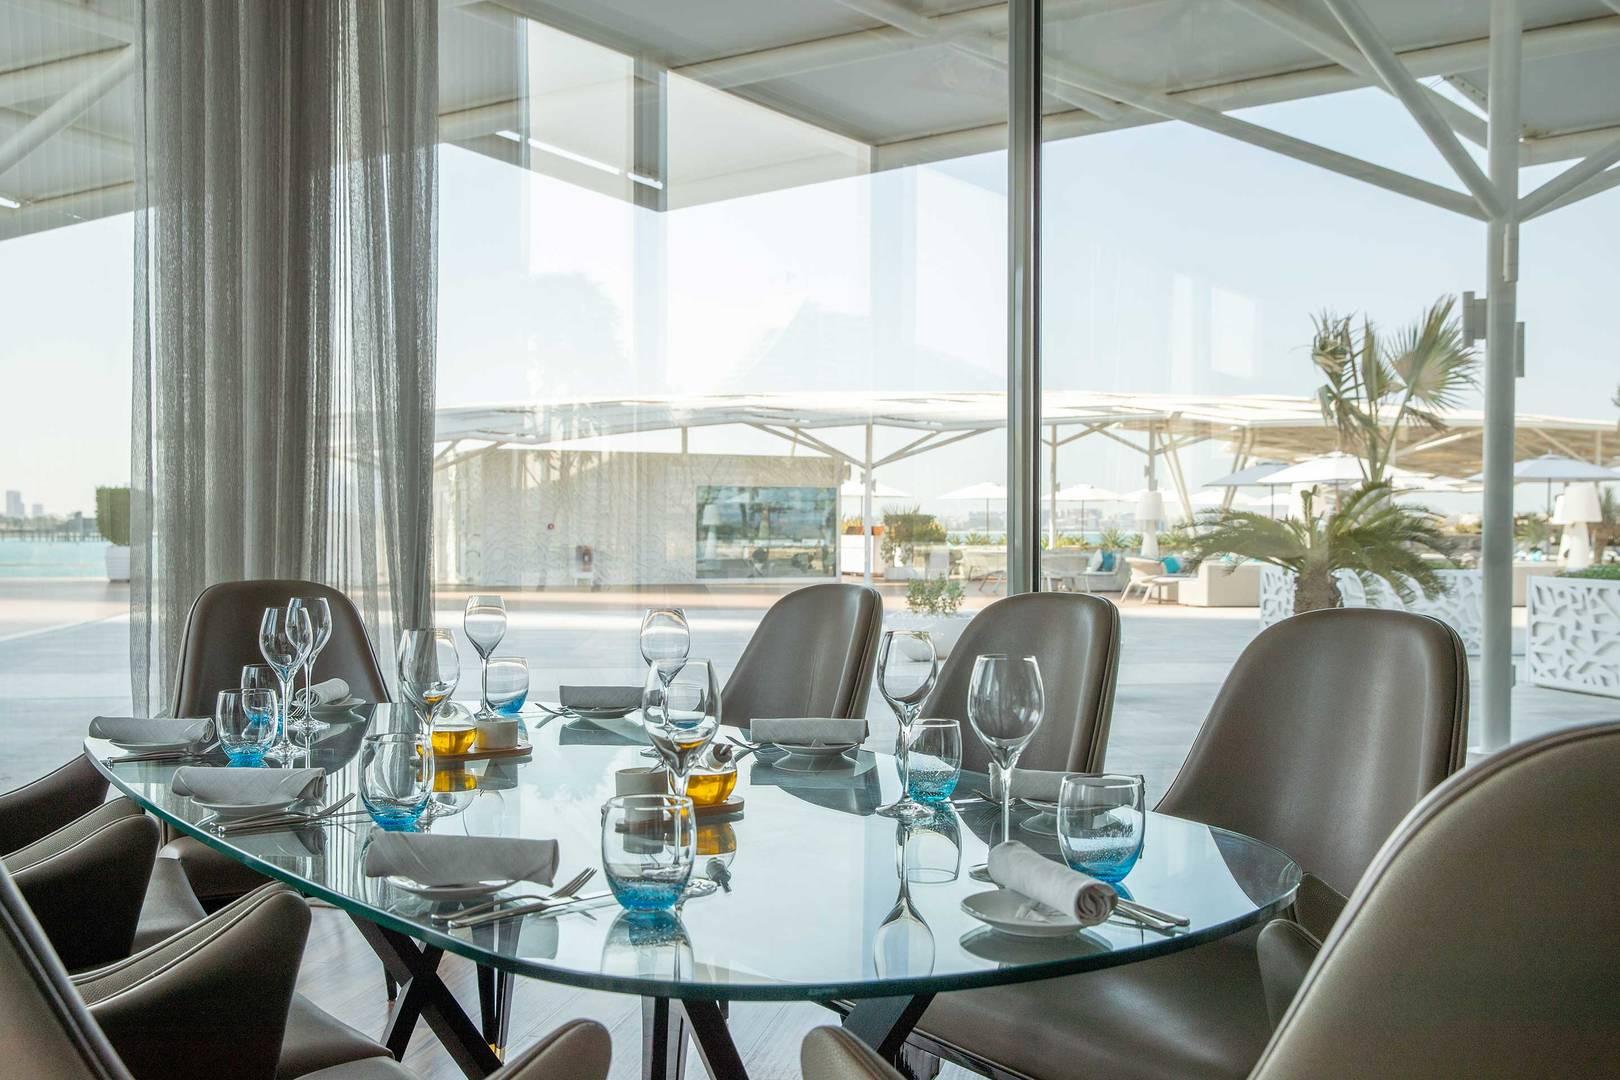 https://cdn.jumeirah.com/-/mediadh/DH/Hospitality/Jumeirah/Restaurants/Dubai/Buj-Al-Arab-Scape-restaurant-and-lounge/Restaurant-Gallery/Burj-Al-Arab-Scape-Window-Seat-6-4.jpg?h=1080&w=1620&hash=A1BF5FBD22E2411E73752D18C55D6C11